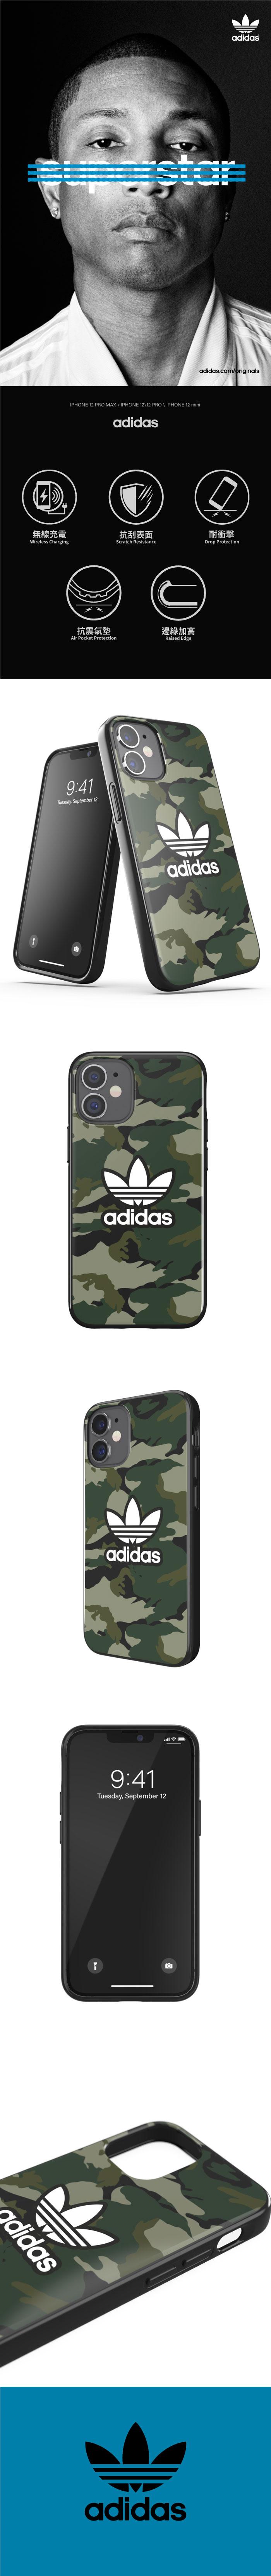 Adidas|iPhone 12 mini 手機殼 Originals CAMO 迷彩系列